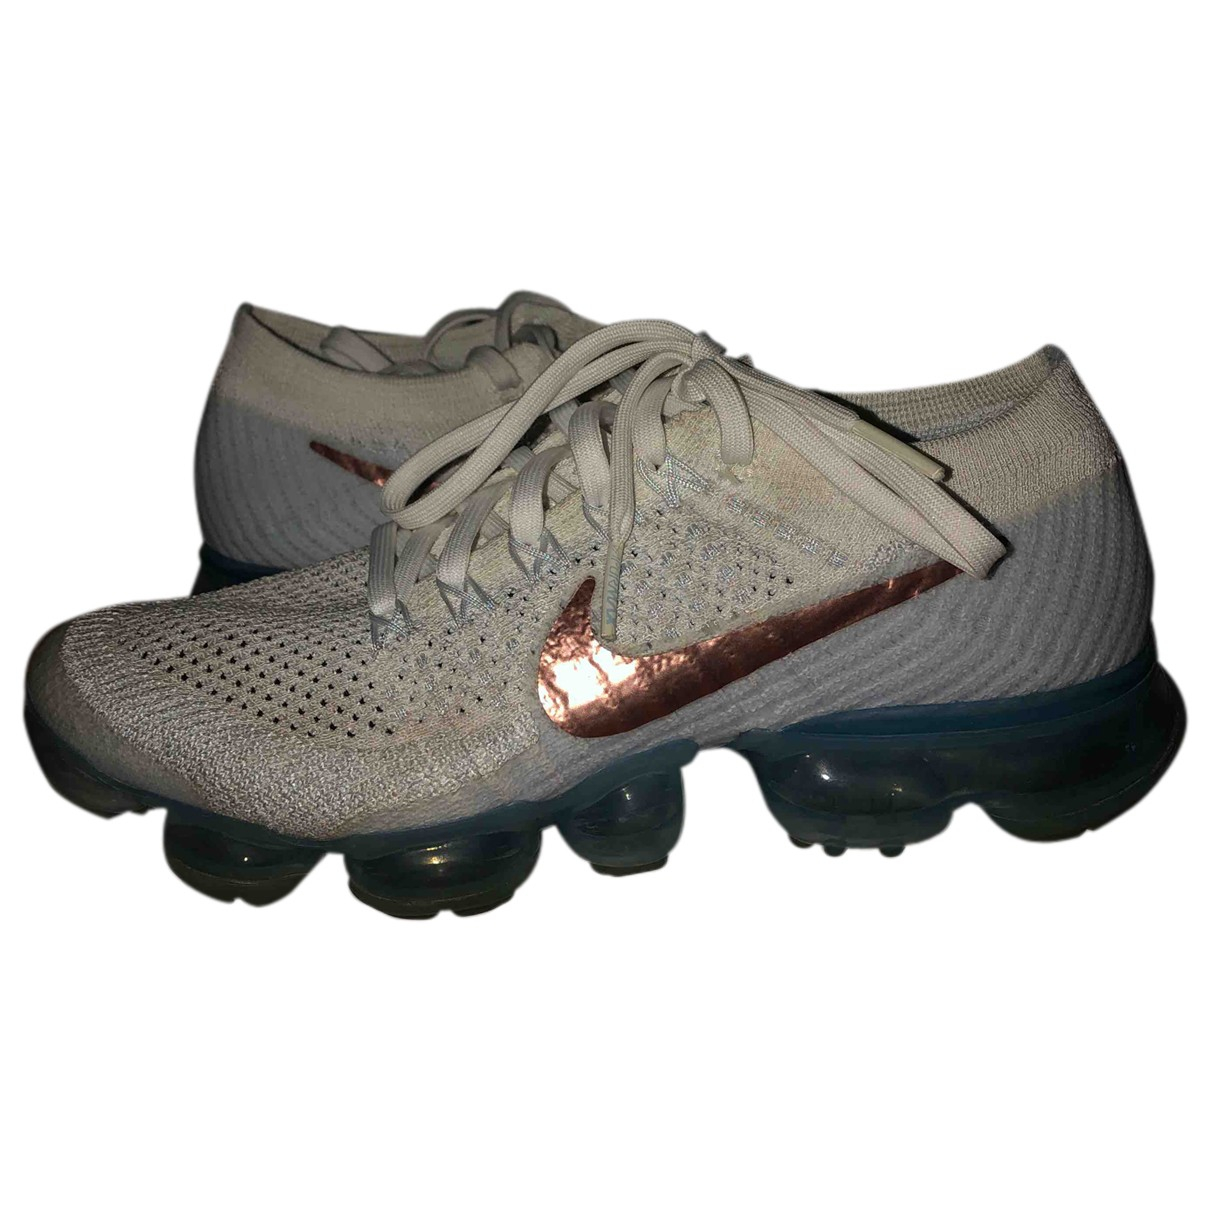 Nike Air VaporMax Sneakers in  Weiss Leinen